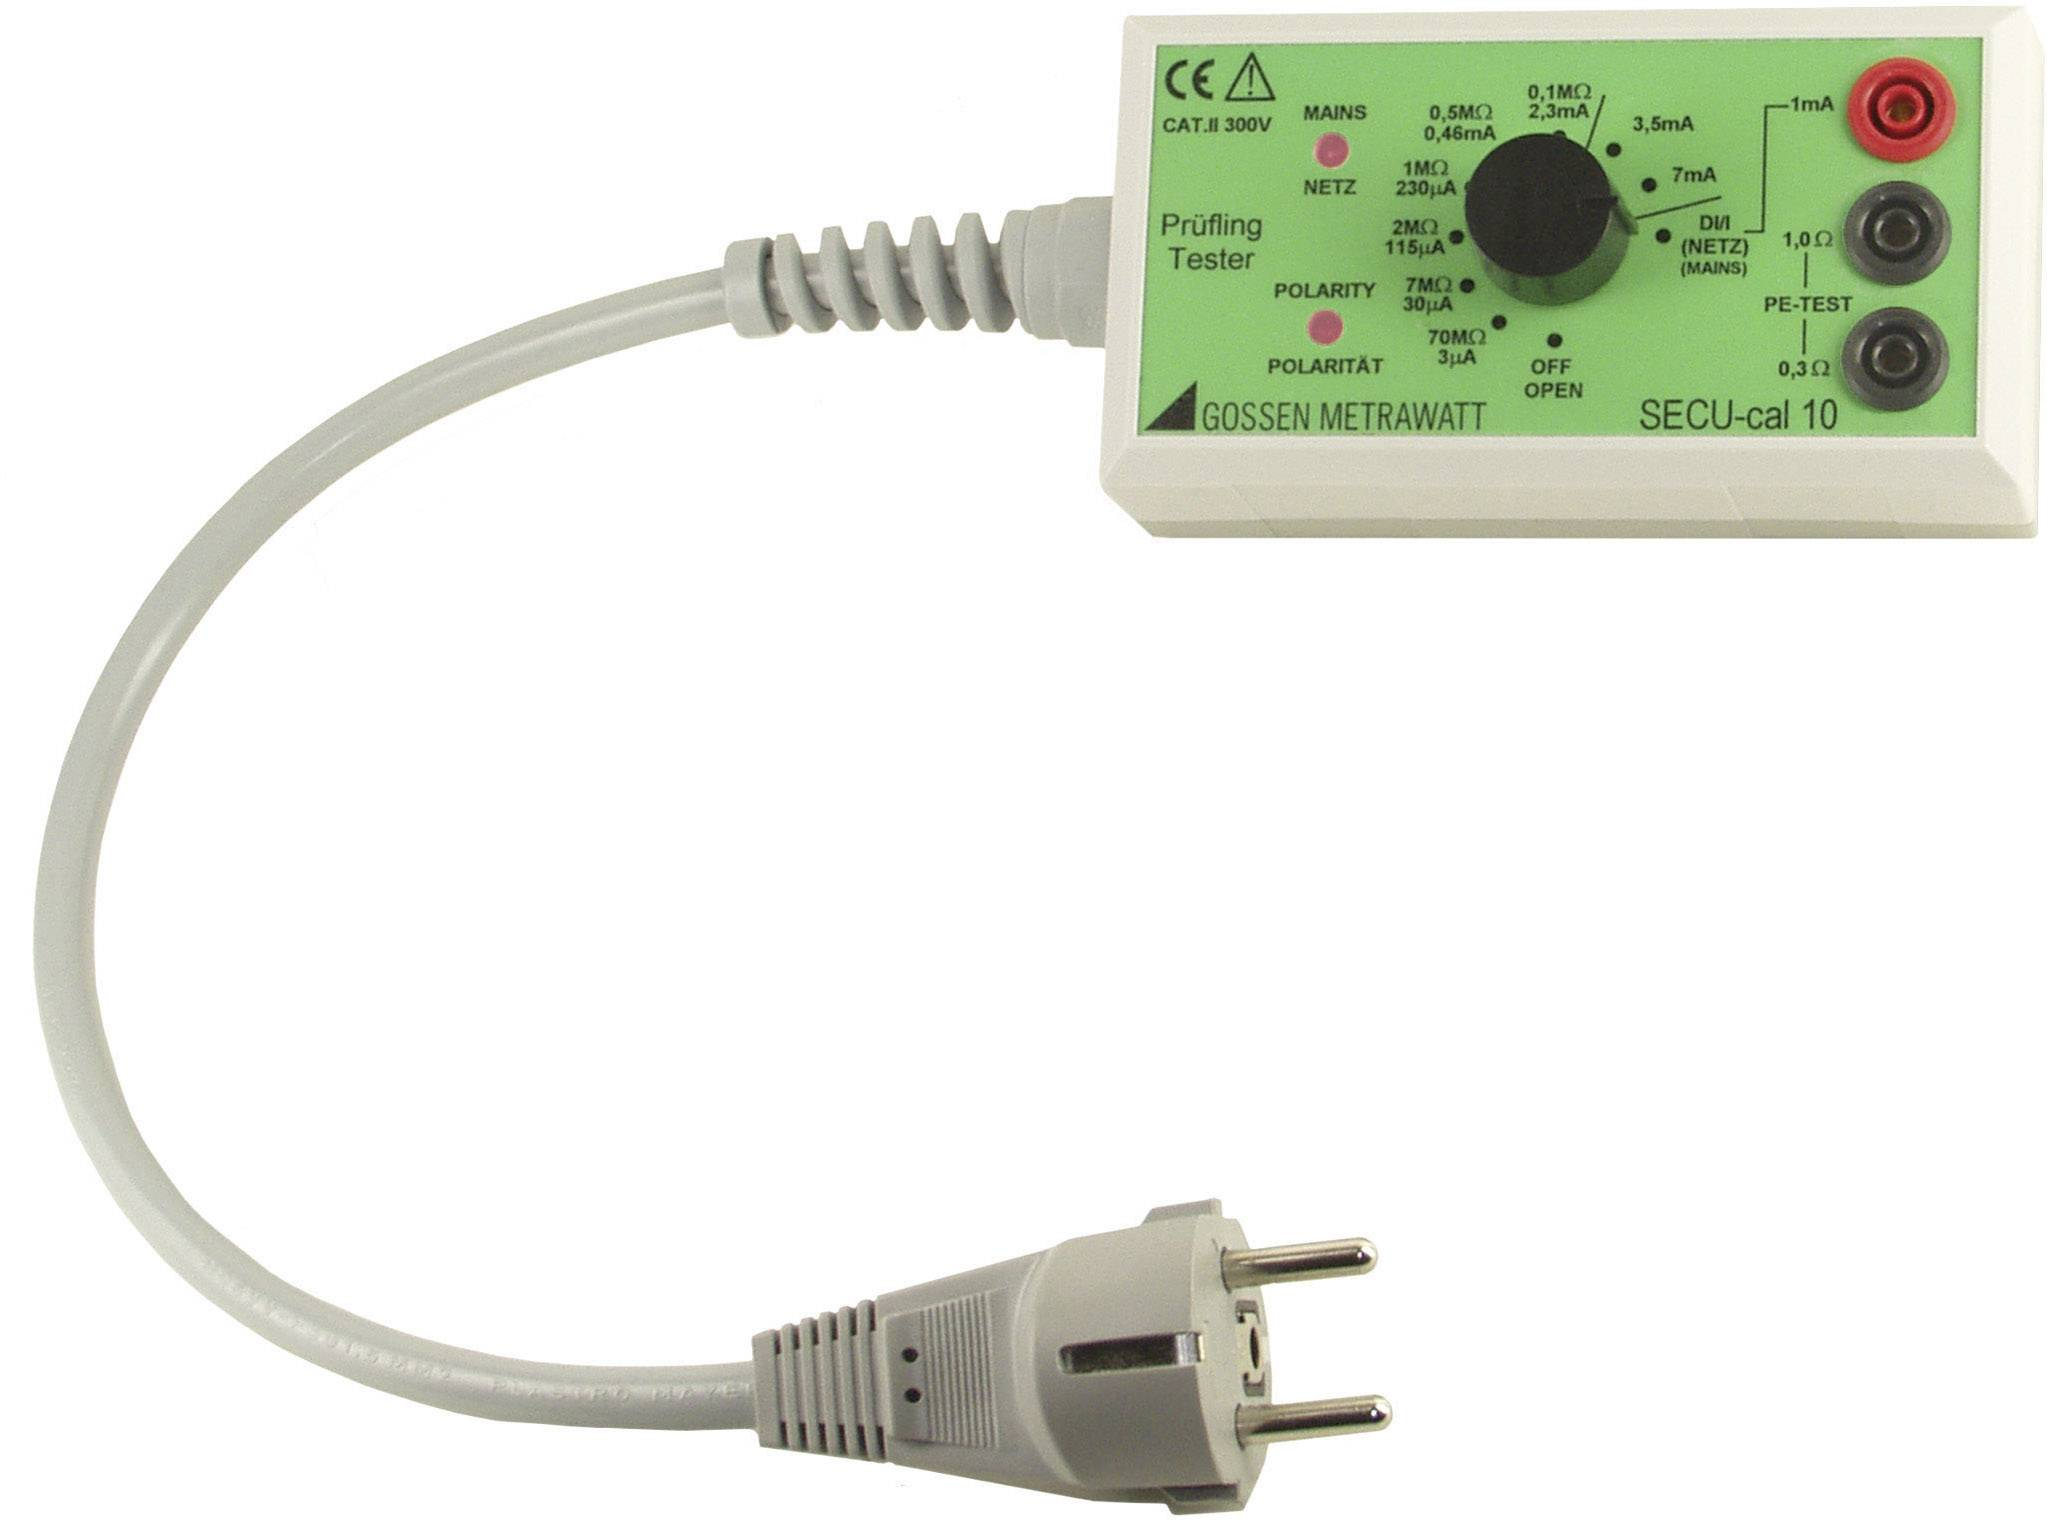 Kalibrační adaptér SECU-CAL 10 pro zkoušečku SECUTEST Gossen Metrawatt Z715A